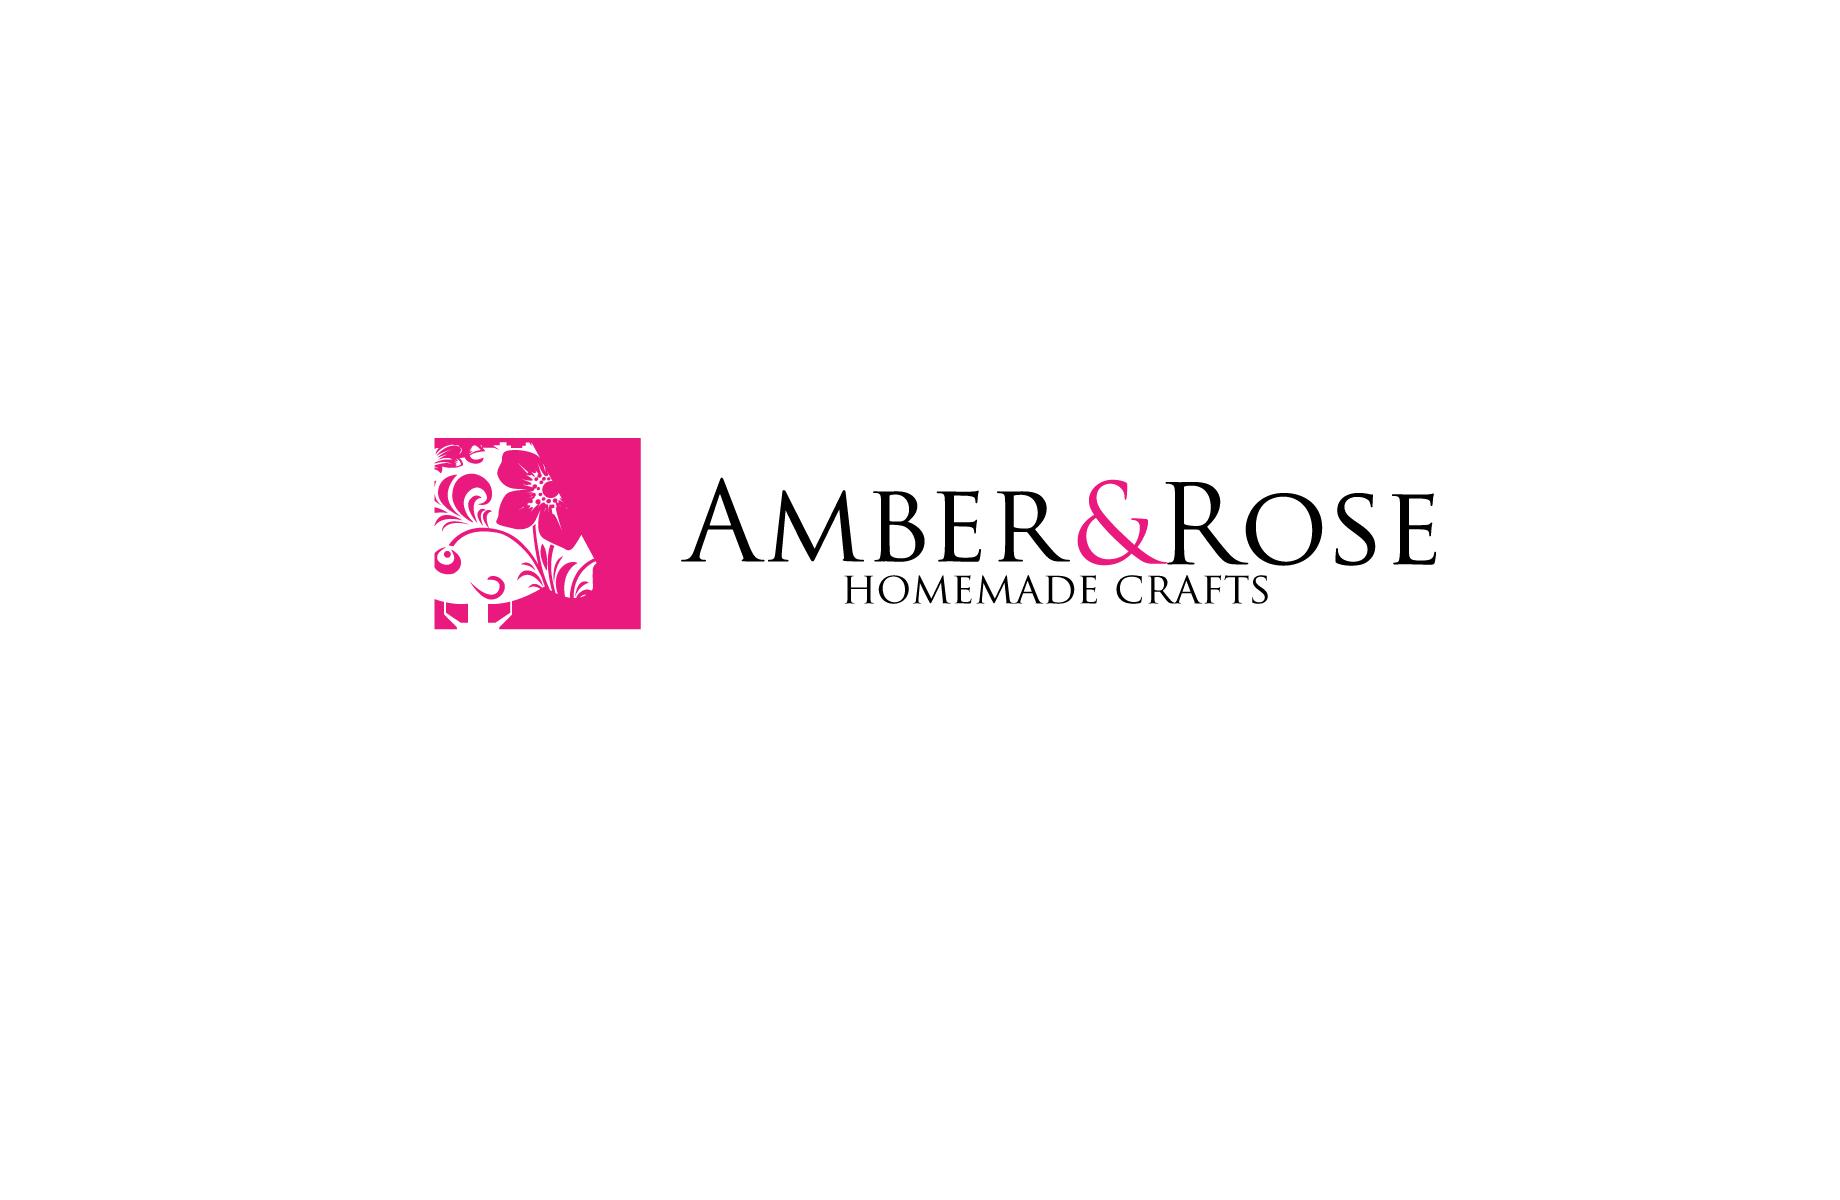 Logo Design by Jan Chua - Entry No. 19 in the Logo Design Contest Creative Logo Design for Amber & Rose.